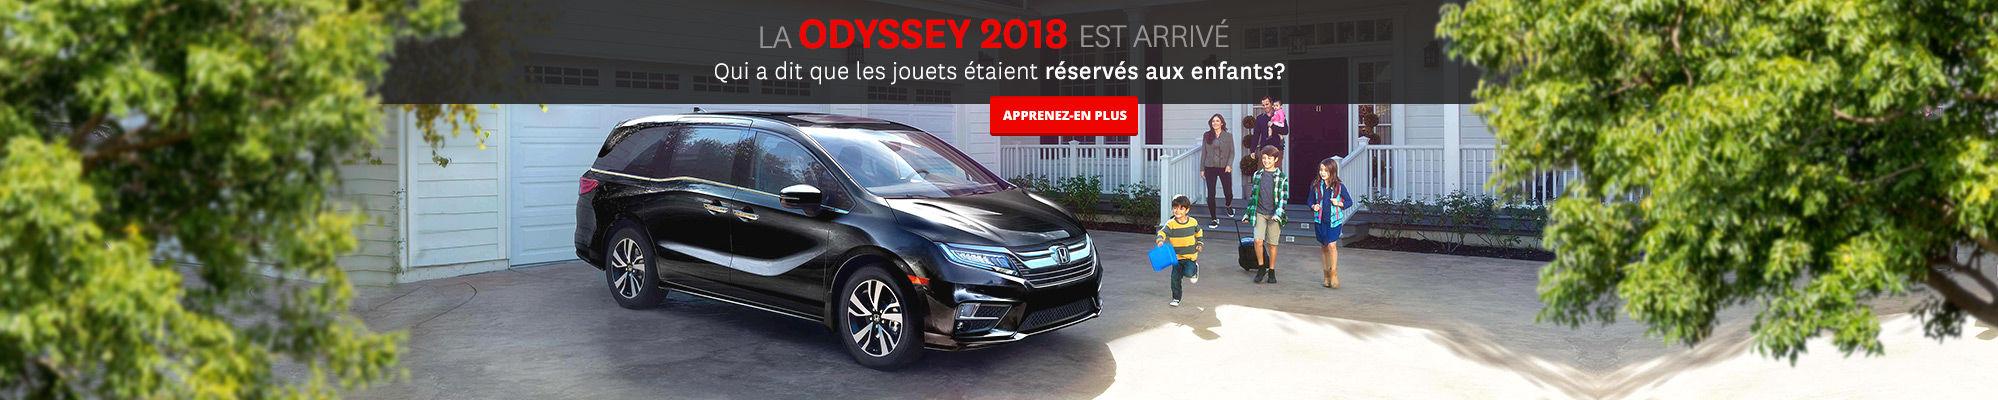 Odyssey 2018